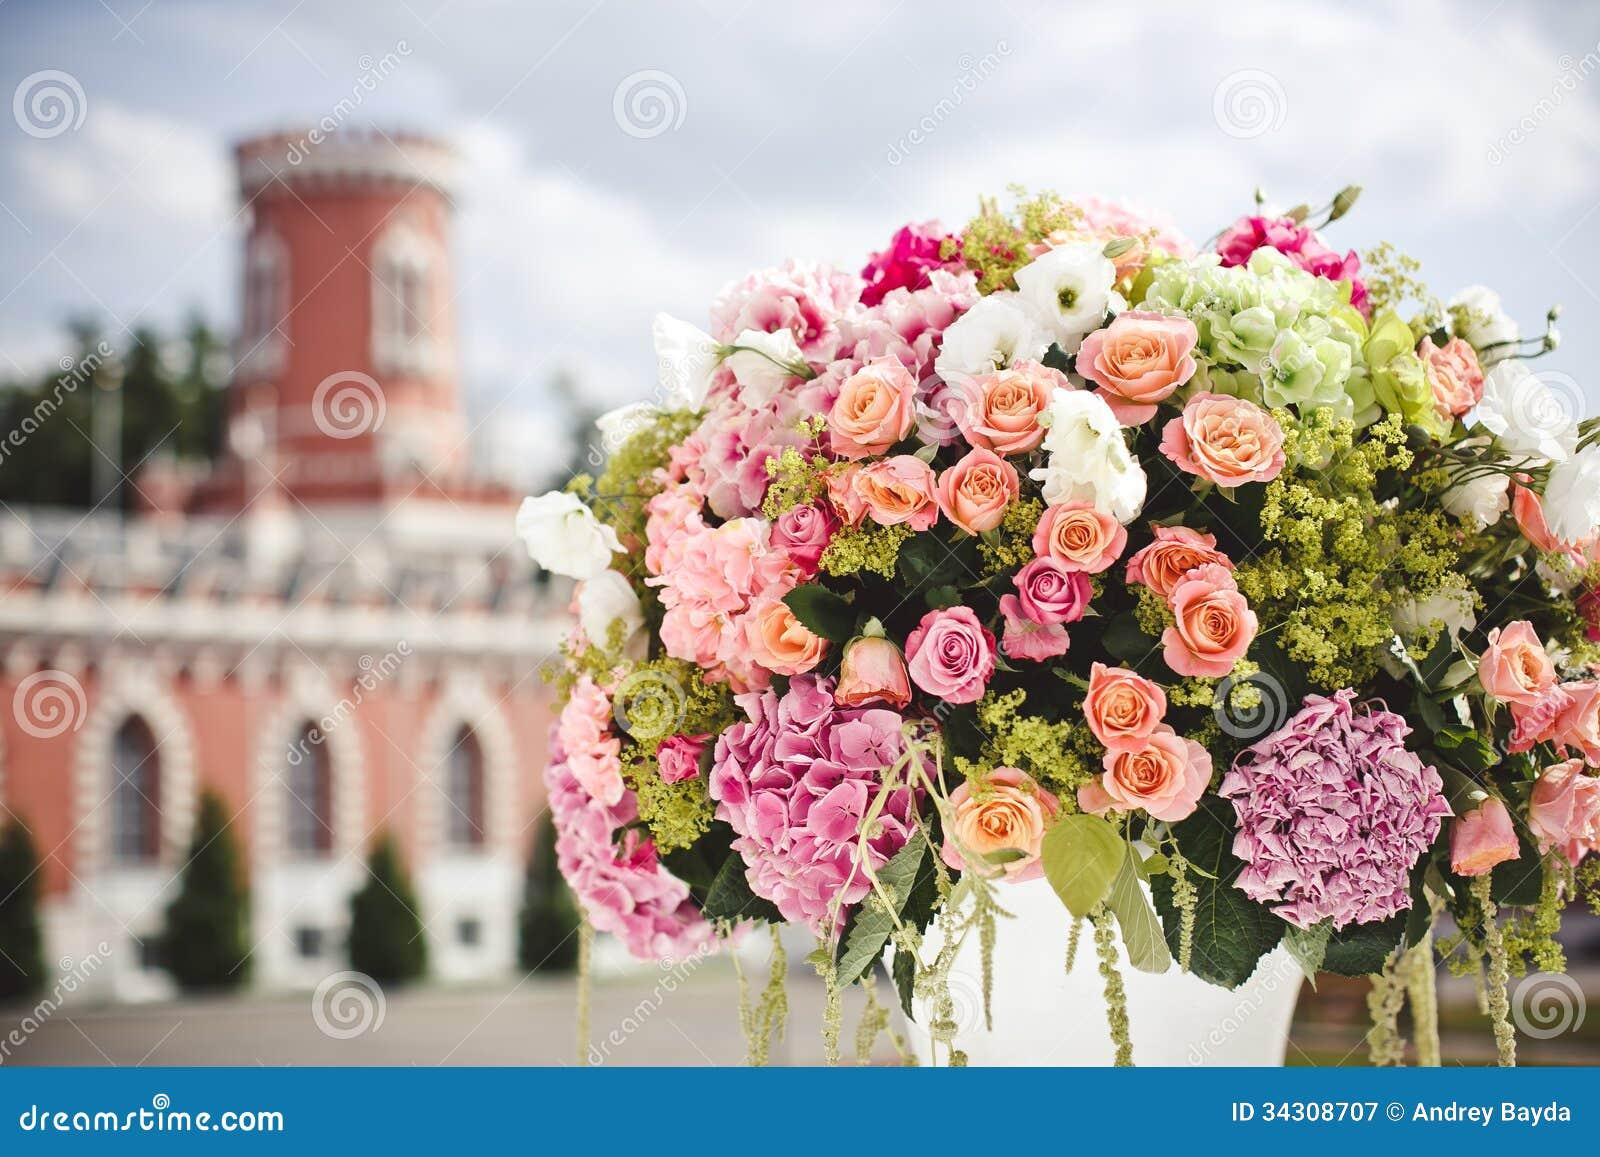 Decoration Of Wedding Flowers Royalty Free Stock Photography Image 34308707